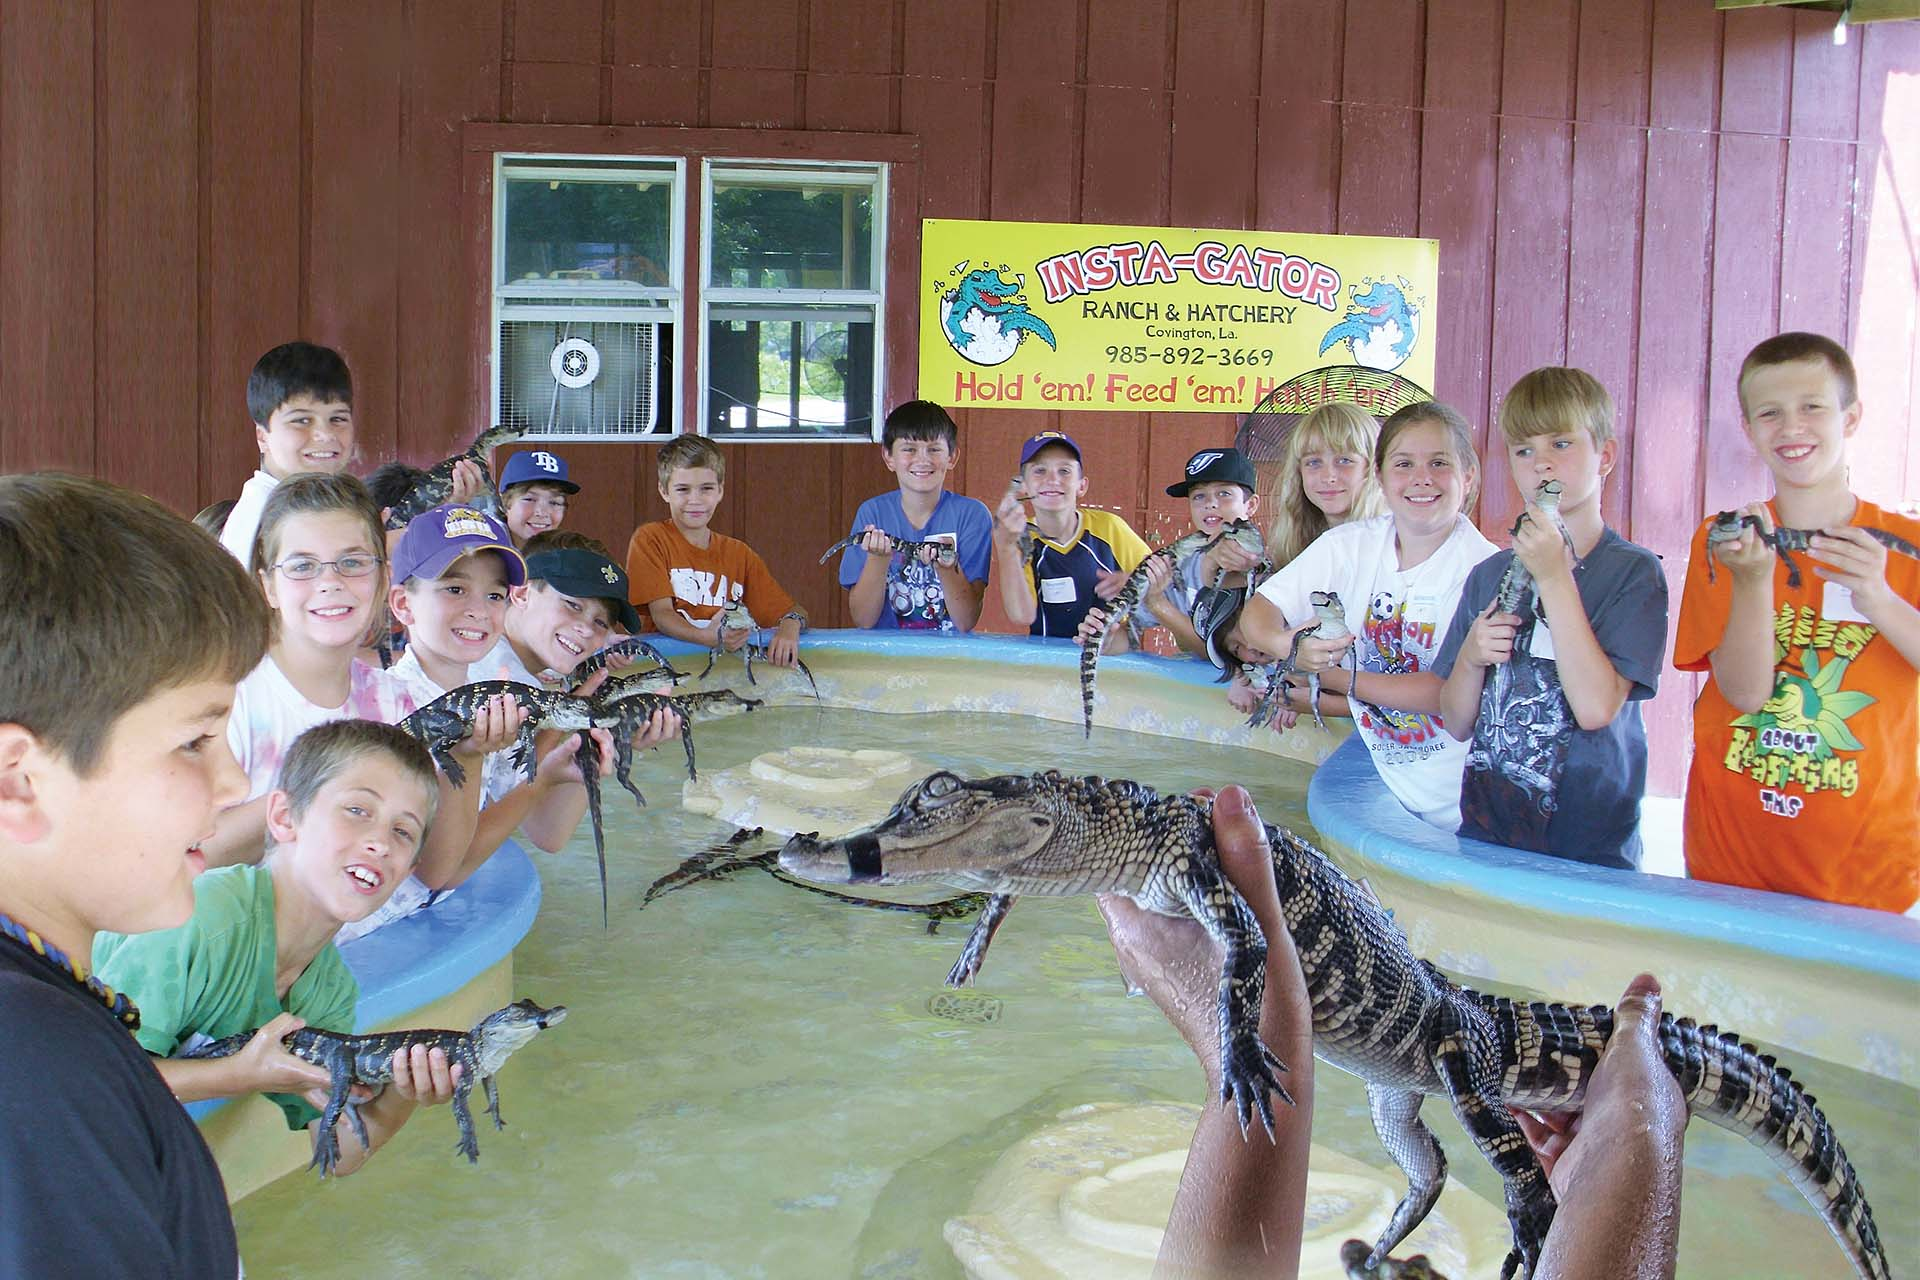 Insta-Gator Alligator Ranch